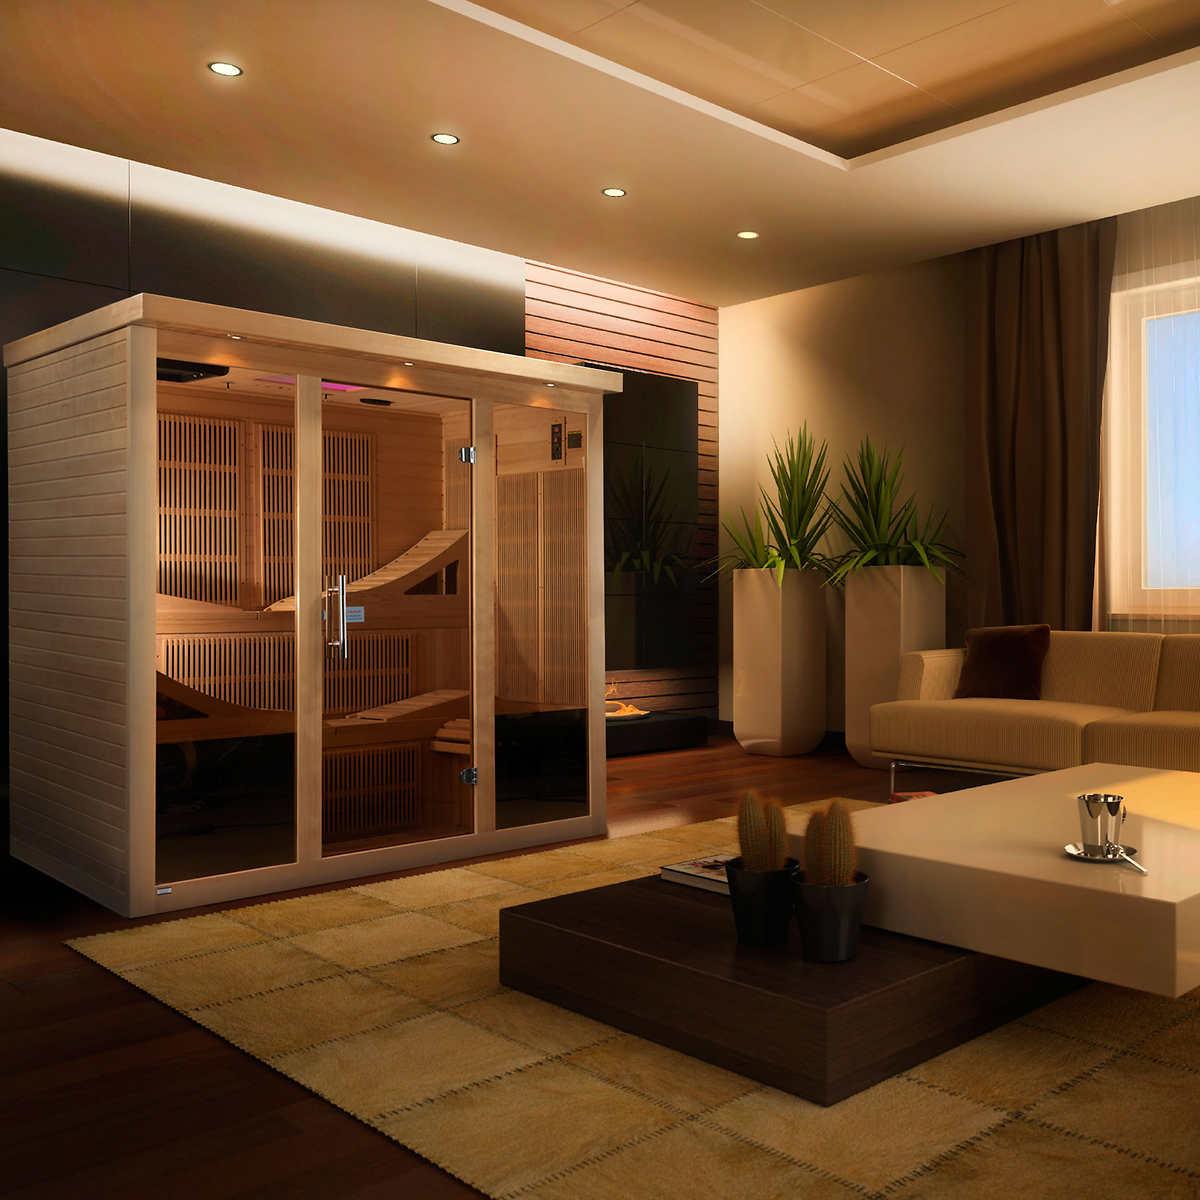 Dynamic Saunas Monaco 6-person Ultra Low EMF FAR Infrared Sauna